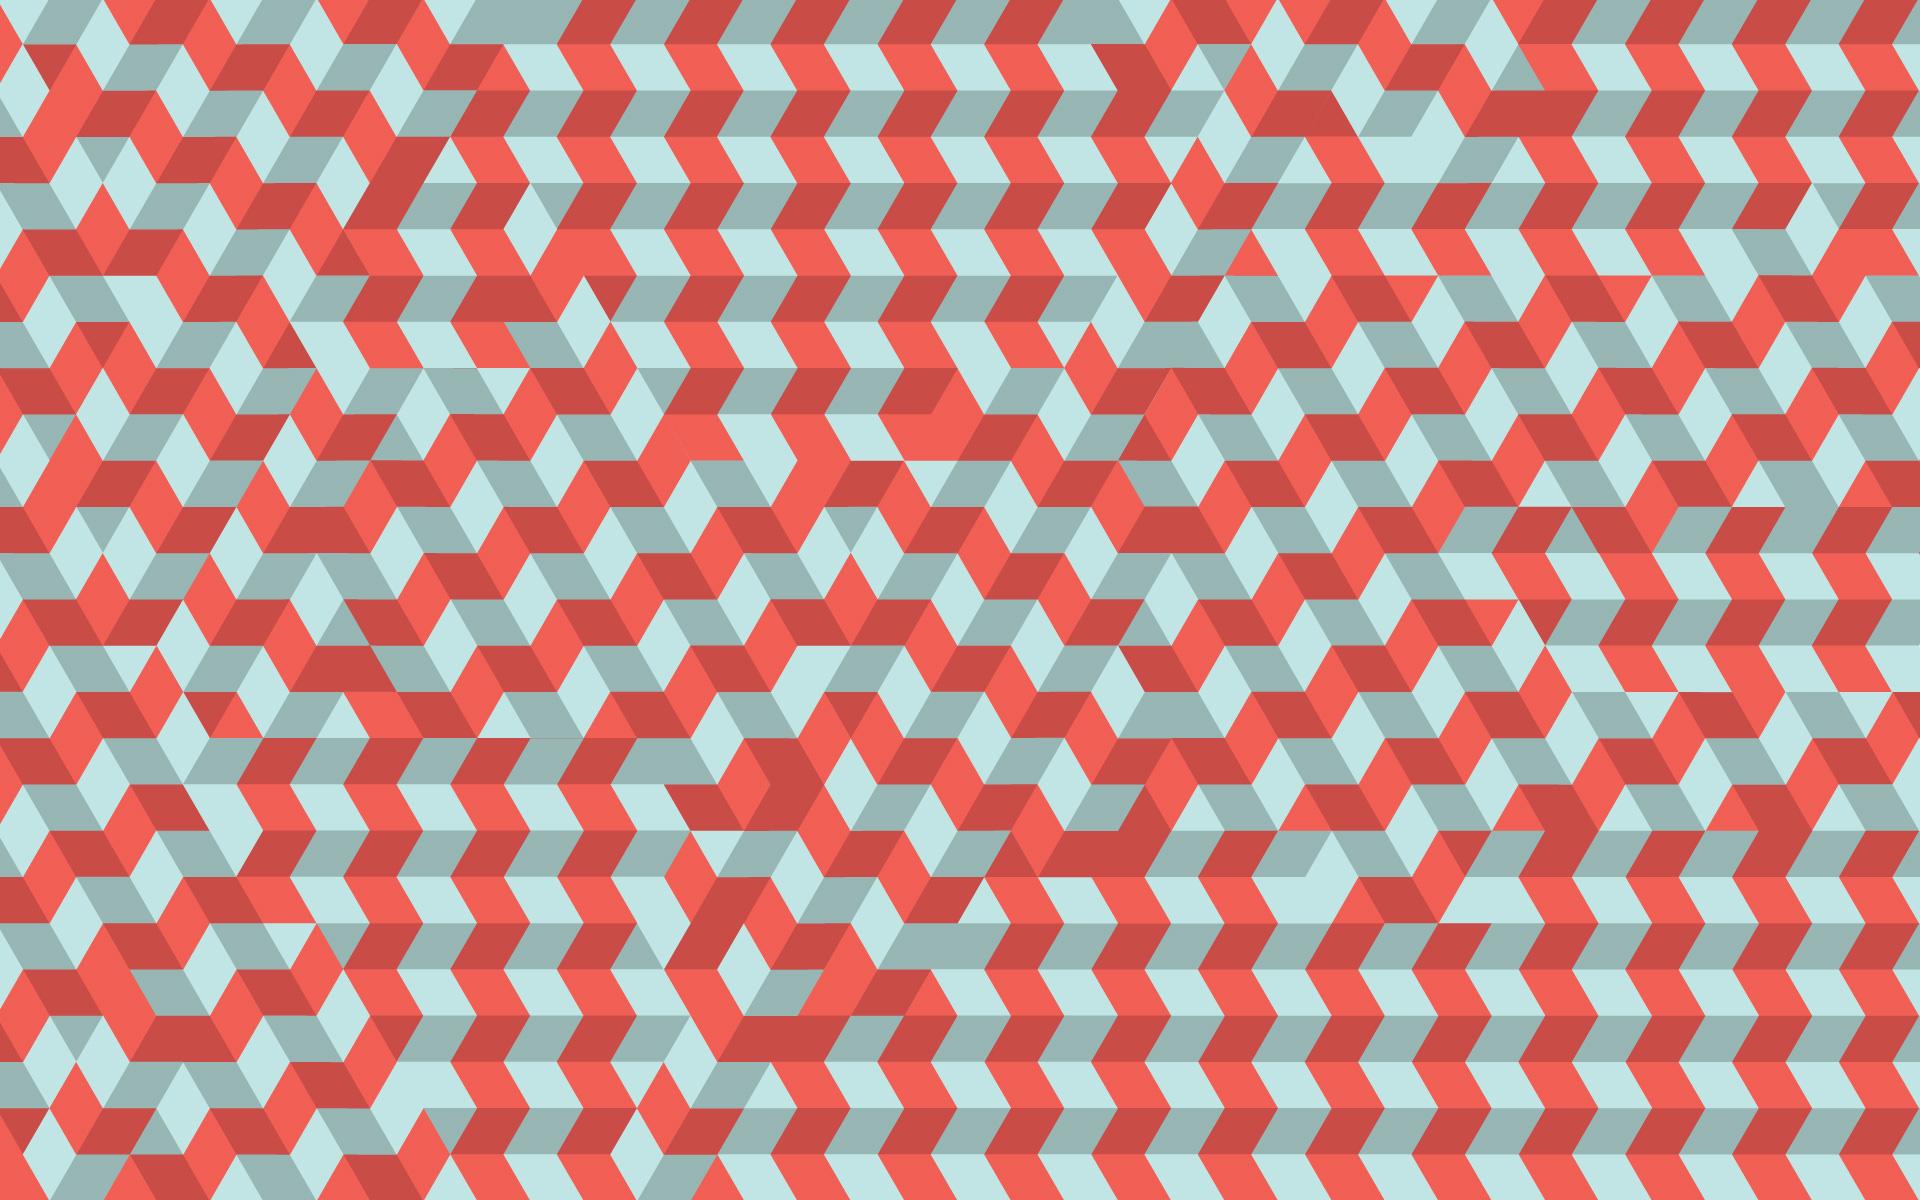 pattern_4.jpg